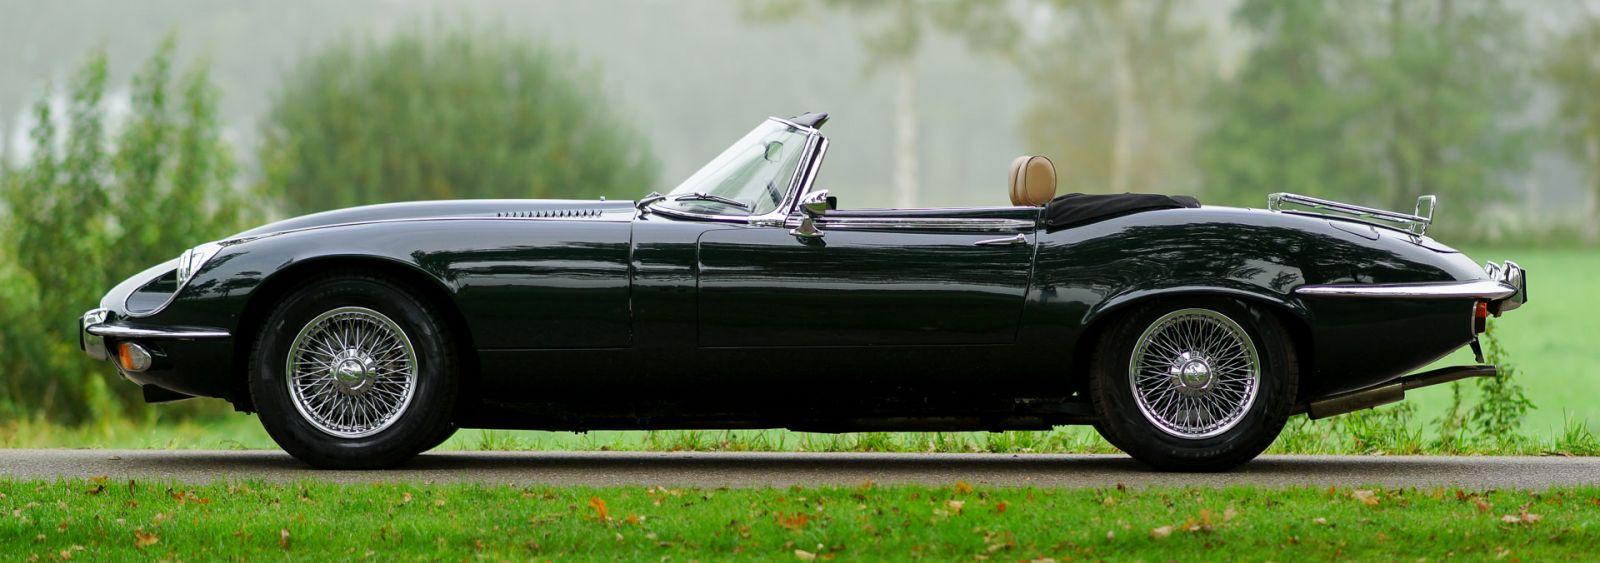 Jaguar E type V12 convertible, 1973 - Classicargarage - NL